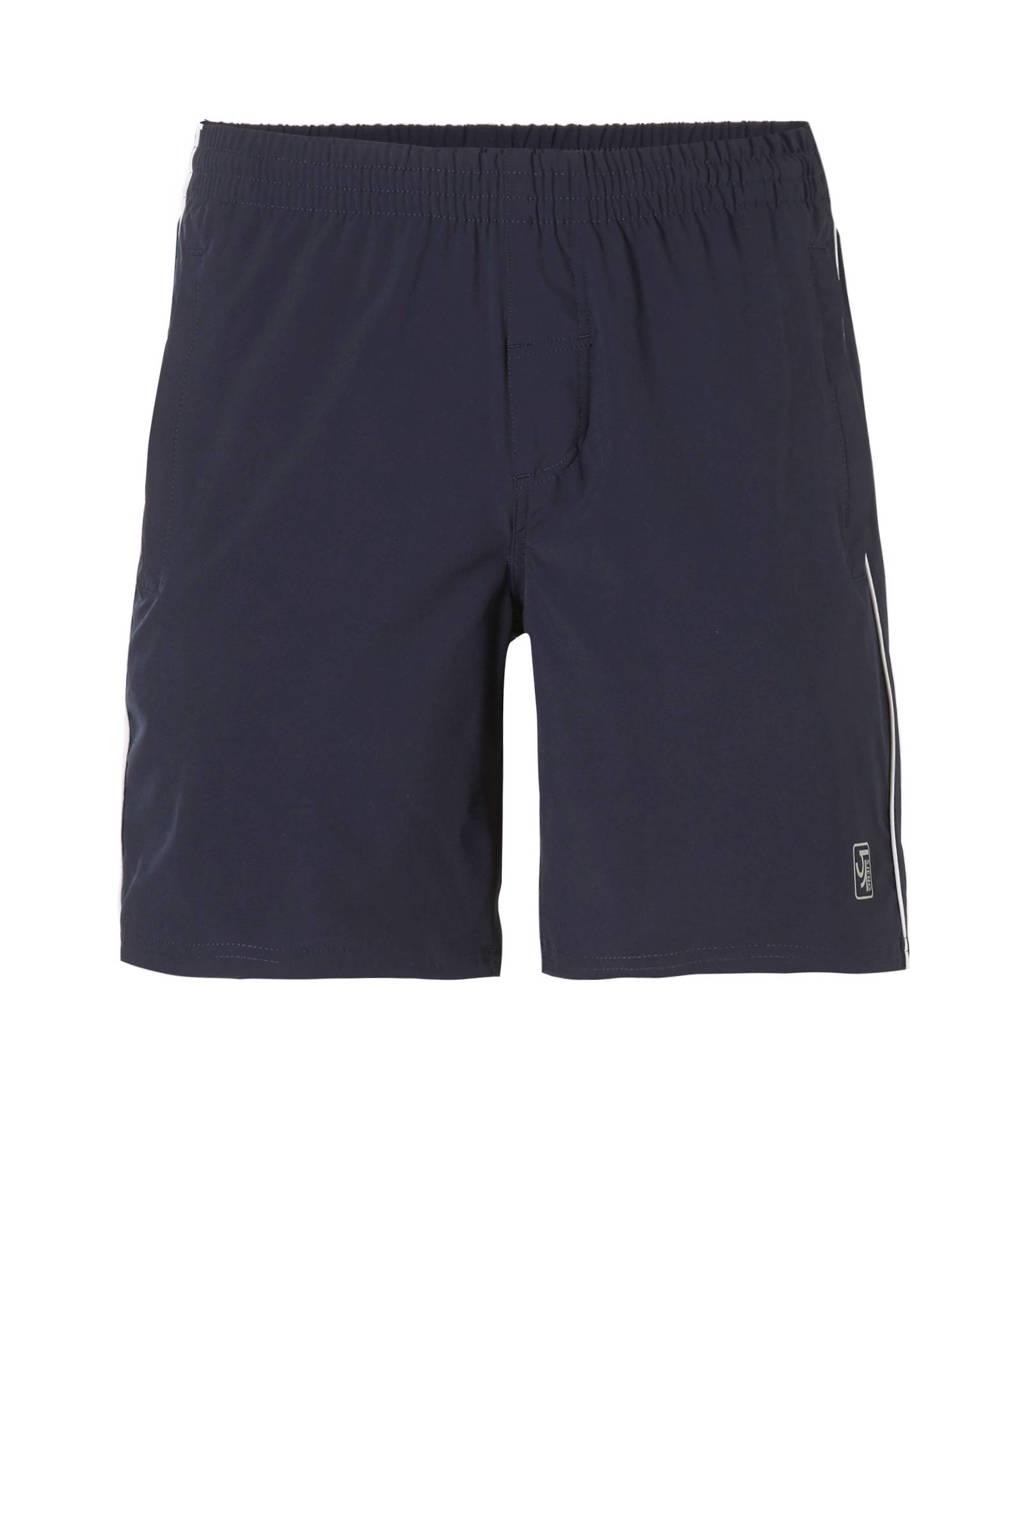 Sjeng Sports   short Set donkerblauw, Marine